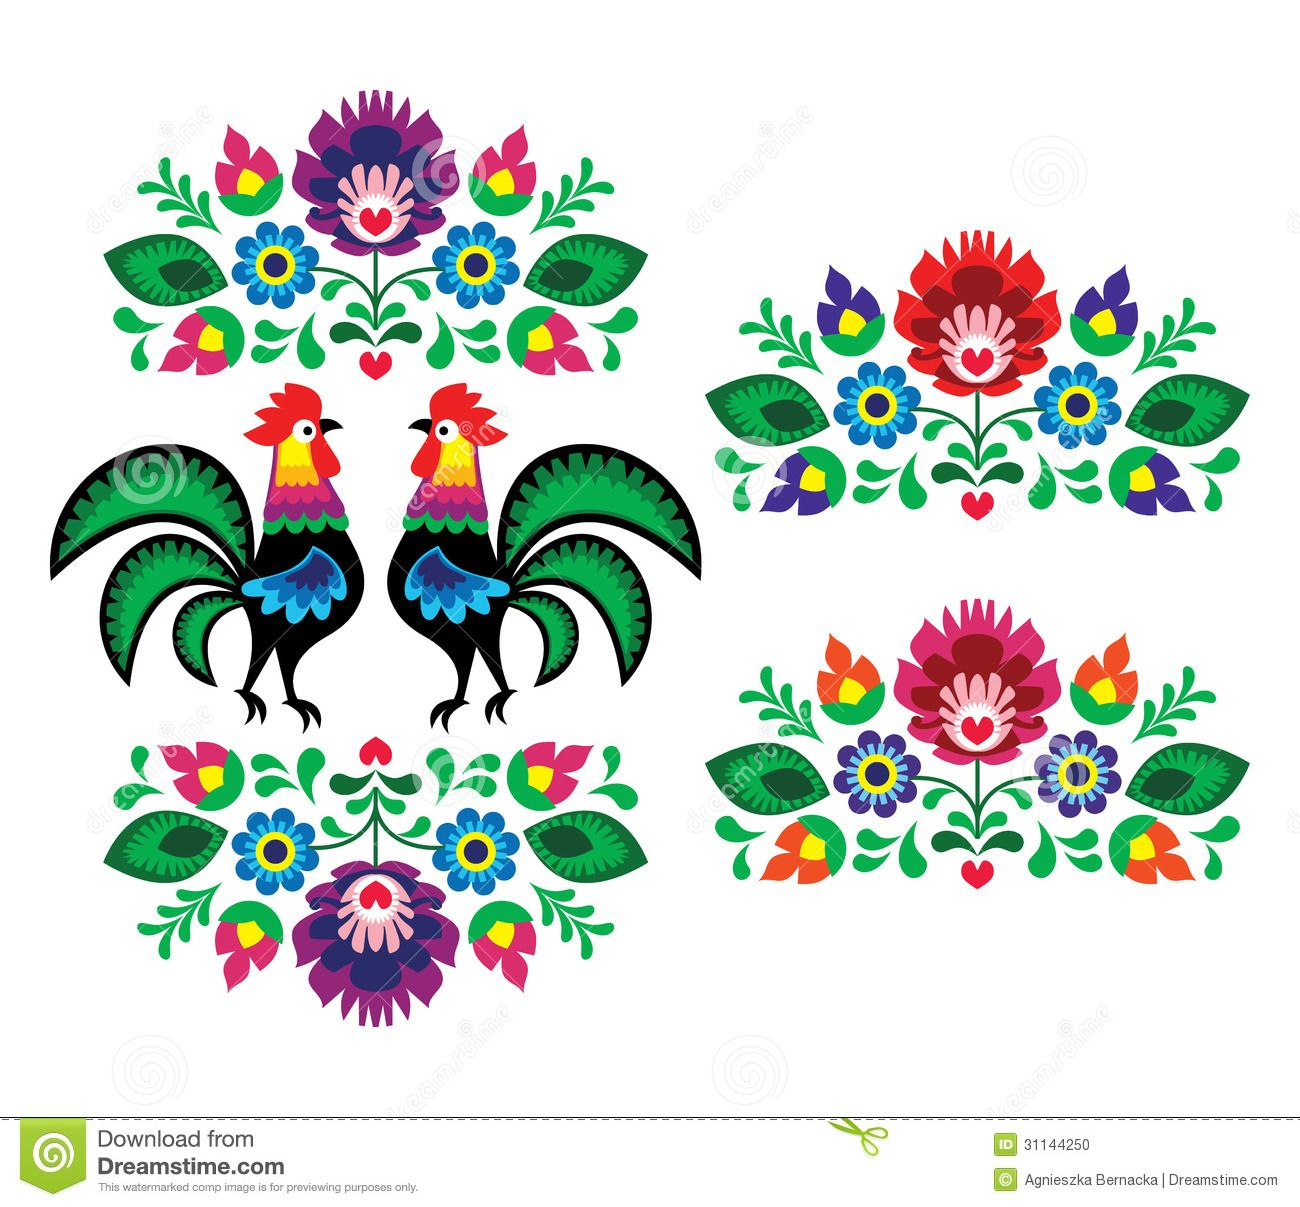 Resultado de imagen para bordado mexicano mano bordado polish ethnic floral embroidery with roosters traditional folk pattern stock vector illustration 139389353 shutterstock bankloansurffo Images